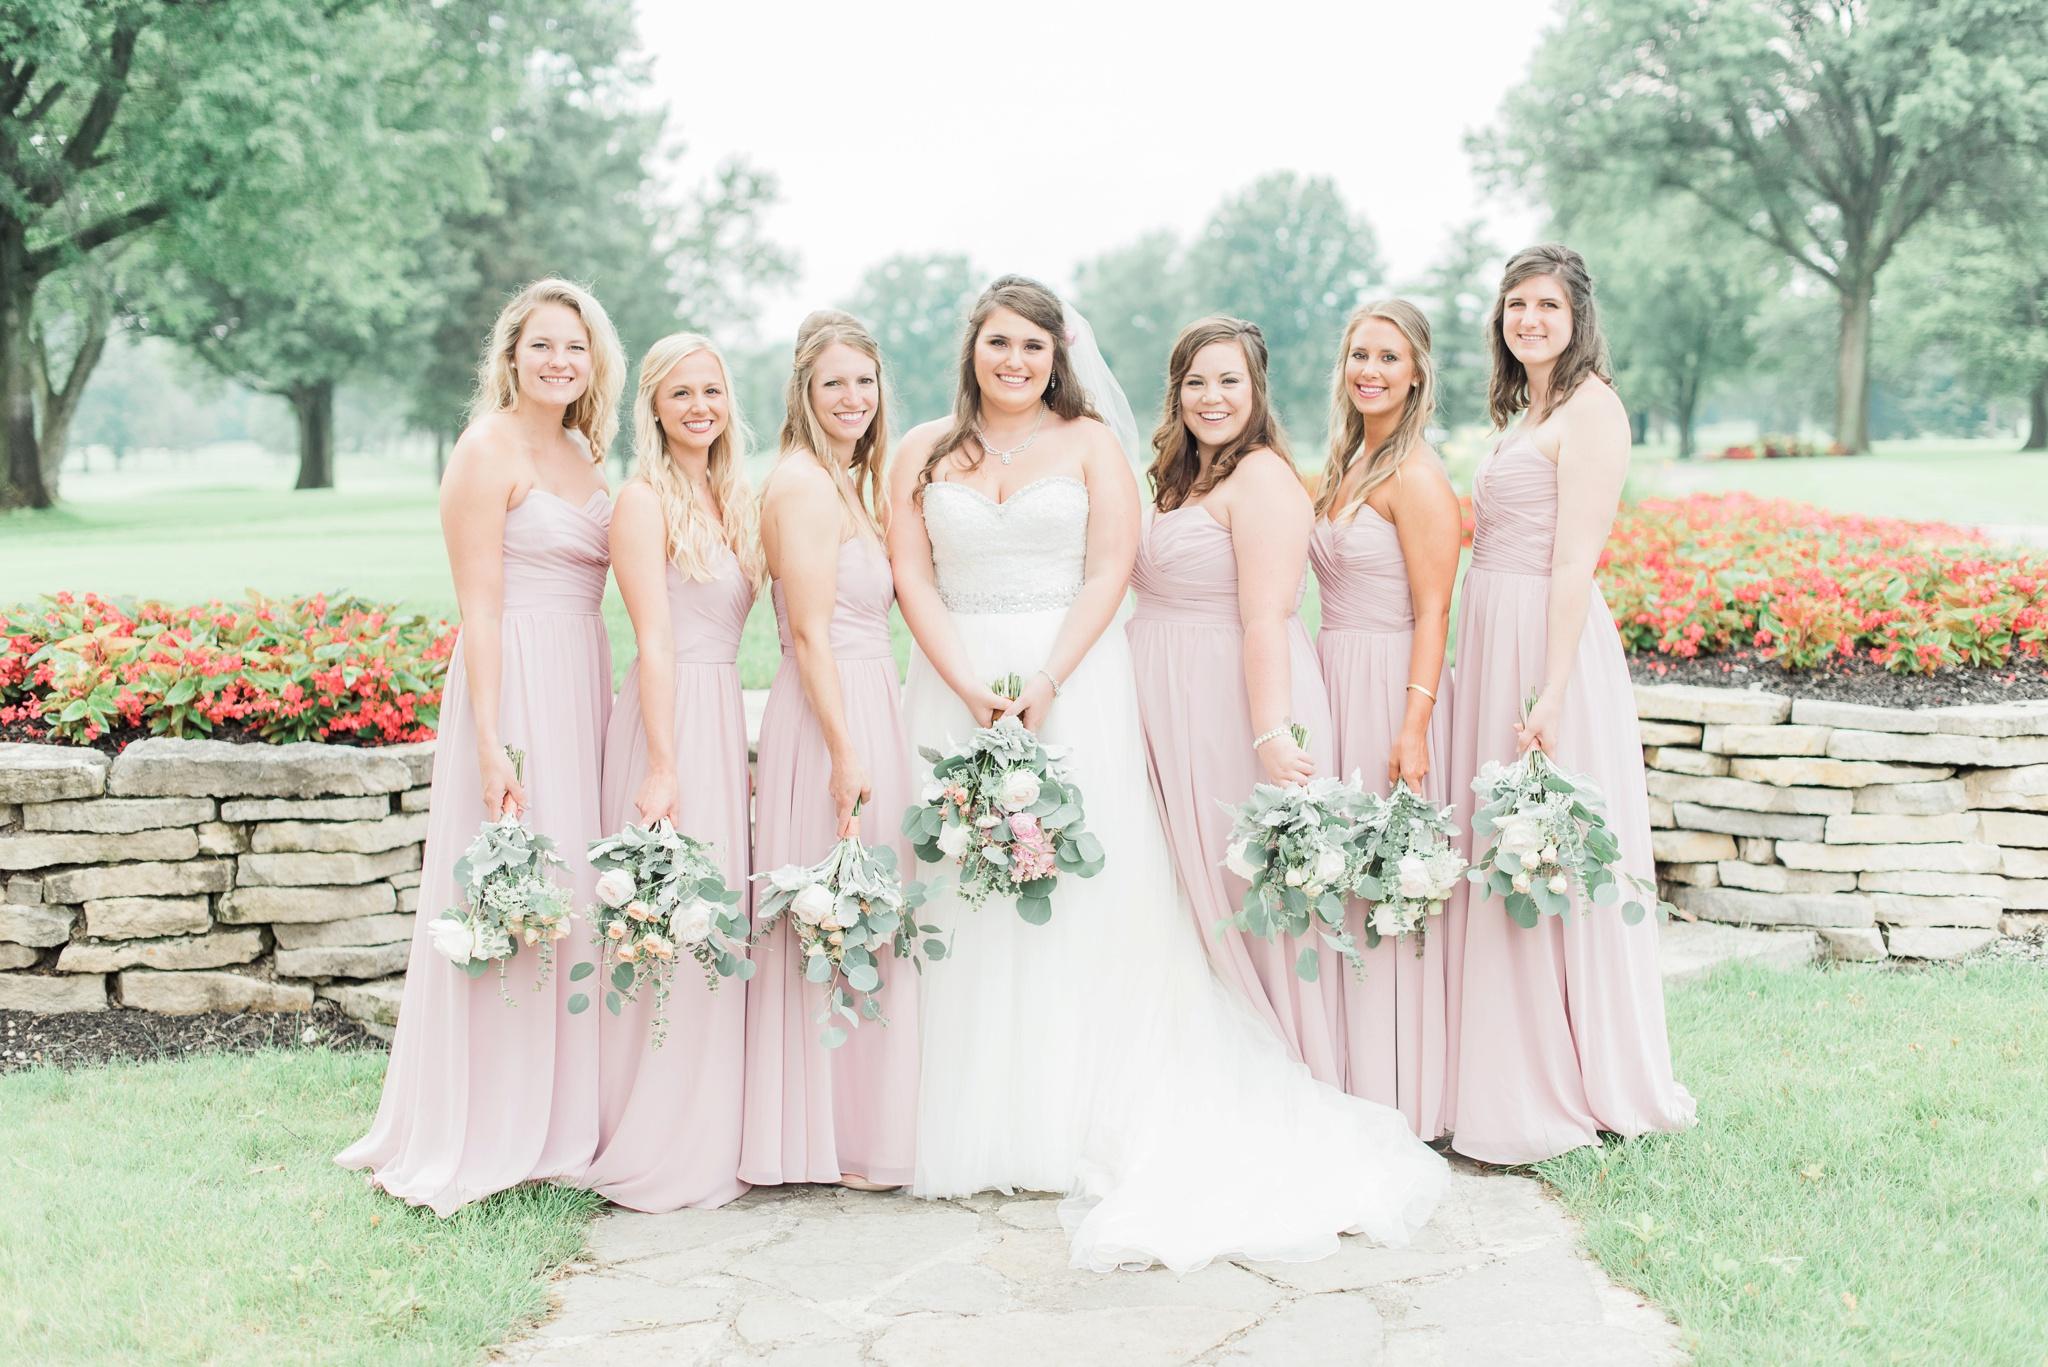 worthington-hills-country-club-wedding-columbus-ohio-meg-evan_0029.jpg